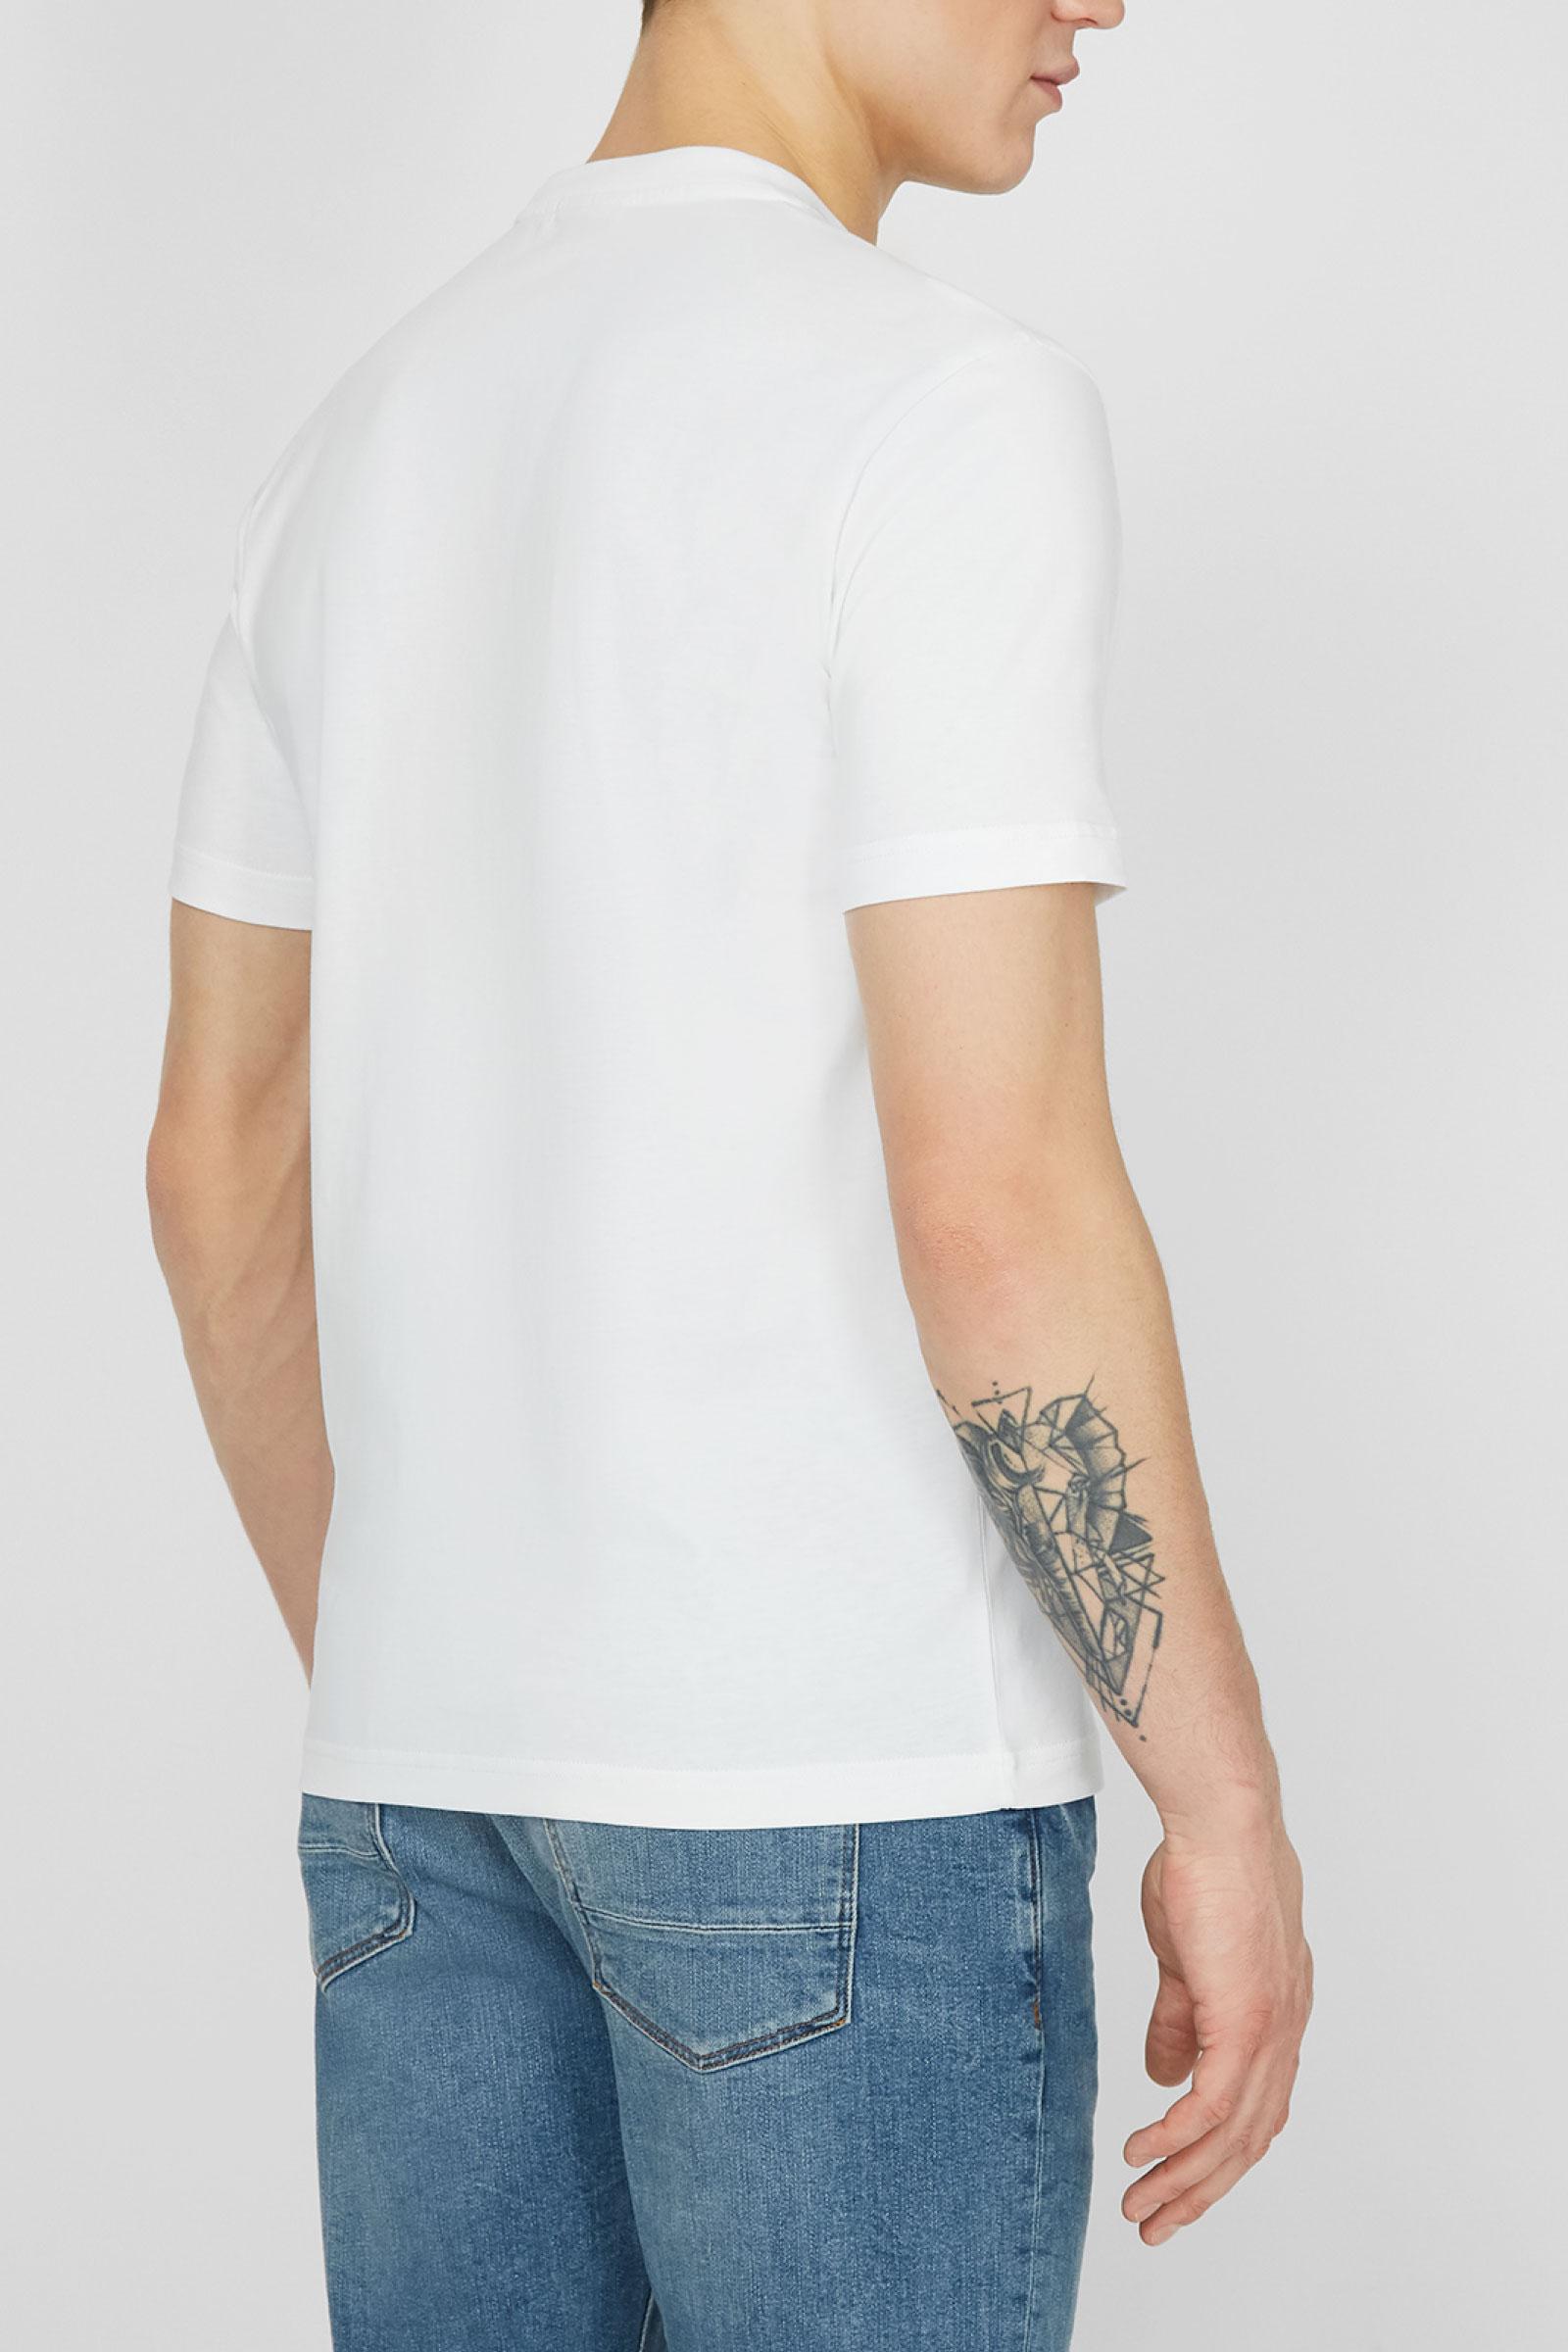 CALVIN KLEIN Men's T-Shirt CALVIN KLEIN | T-Shirt | K10K1067140XY